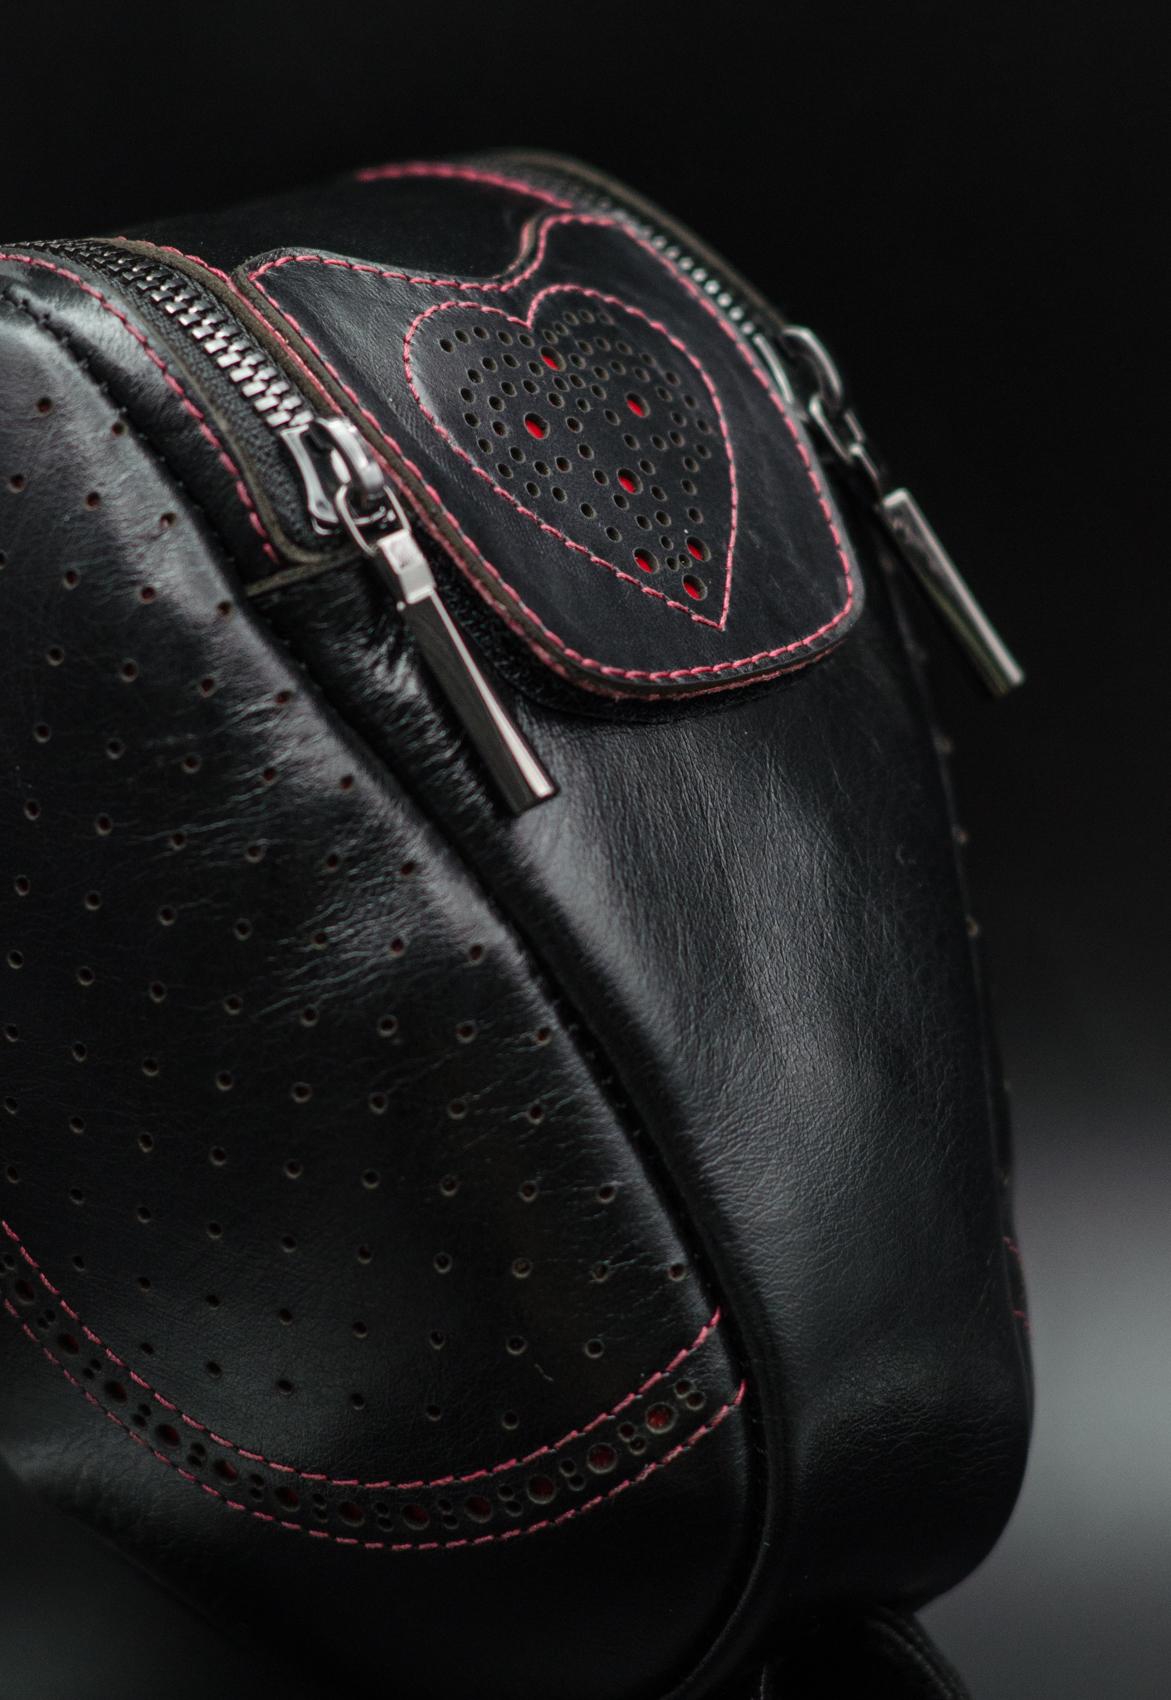 Black heart saddle bag custom leh cycling goods-5.jpg